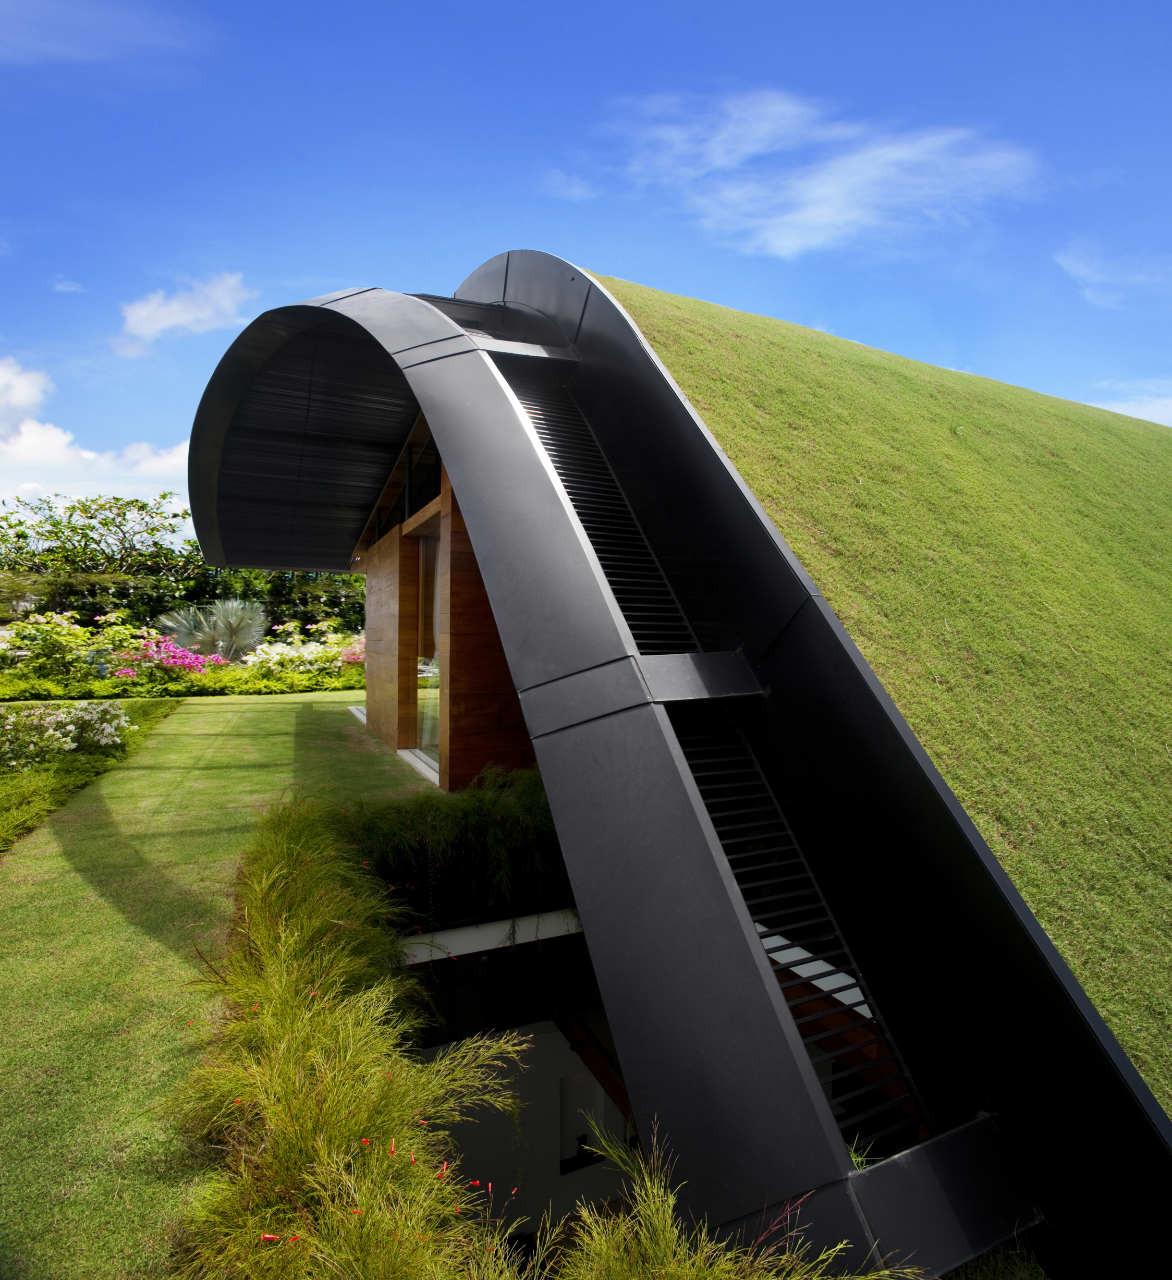 sky garden house Gallery of Sky Garden House / Guz Architects - 3